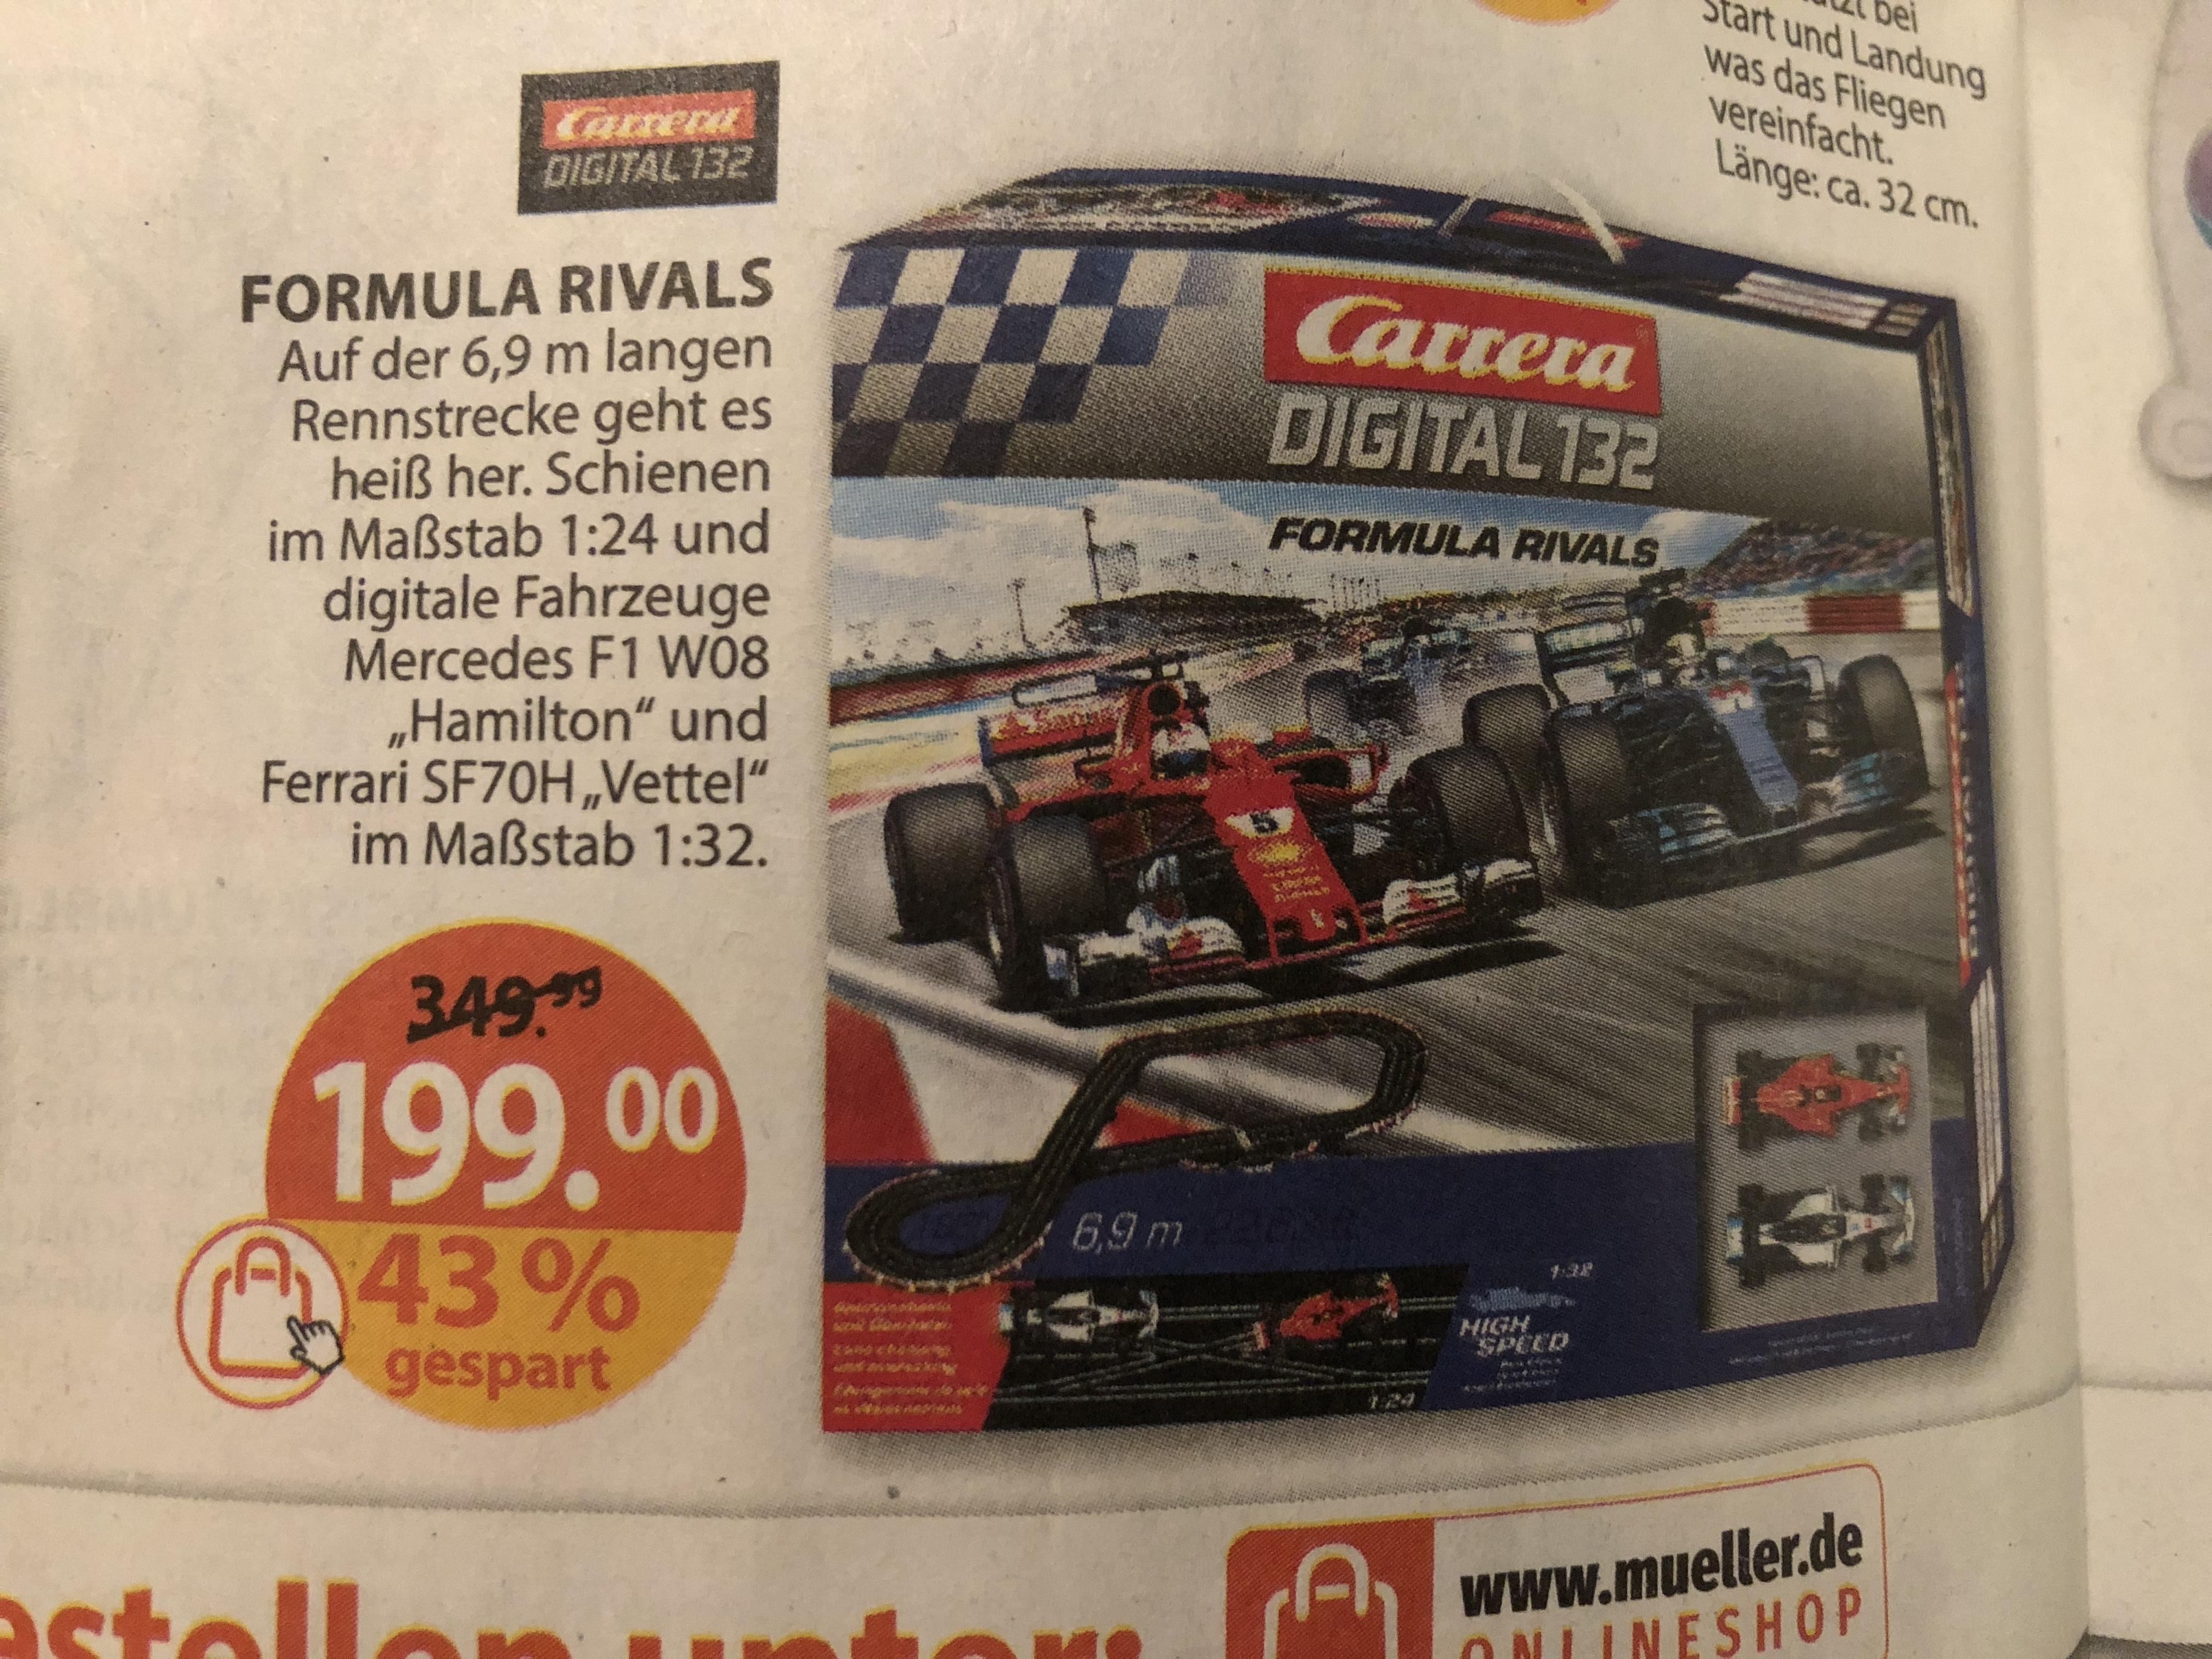 [Müller] Carerra Digital 132 Formula Rivals 169,15€ / Carrera Go Cars 3 Finish First 46,74€ nur 10% von ROSSMANN oder Douglas